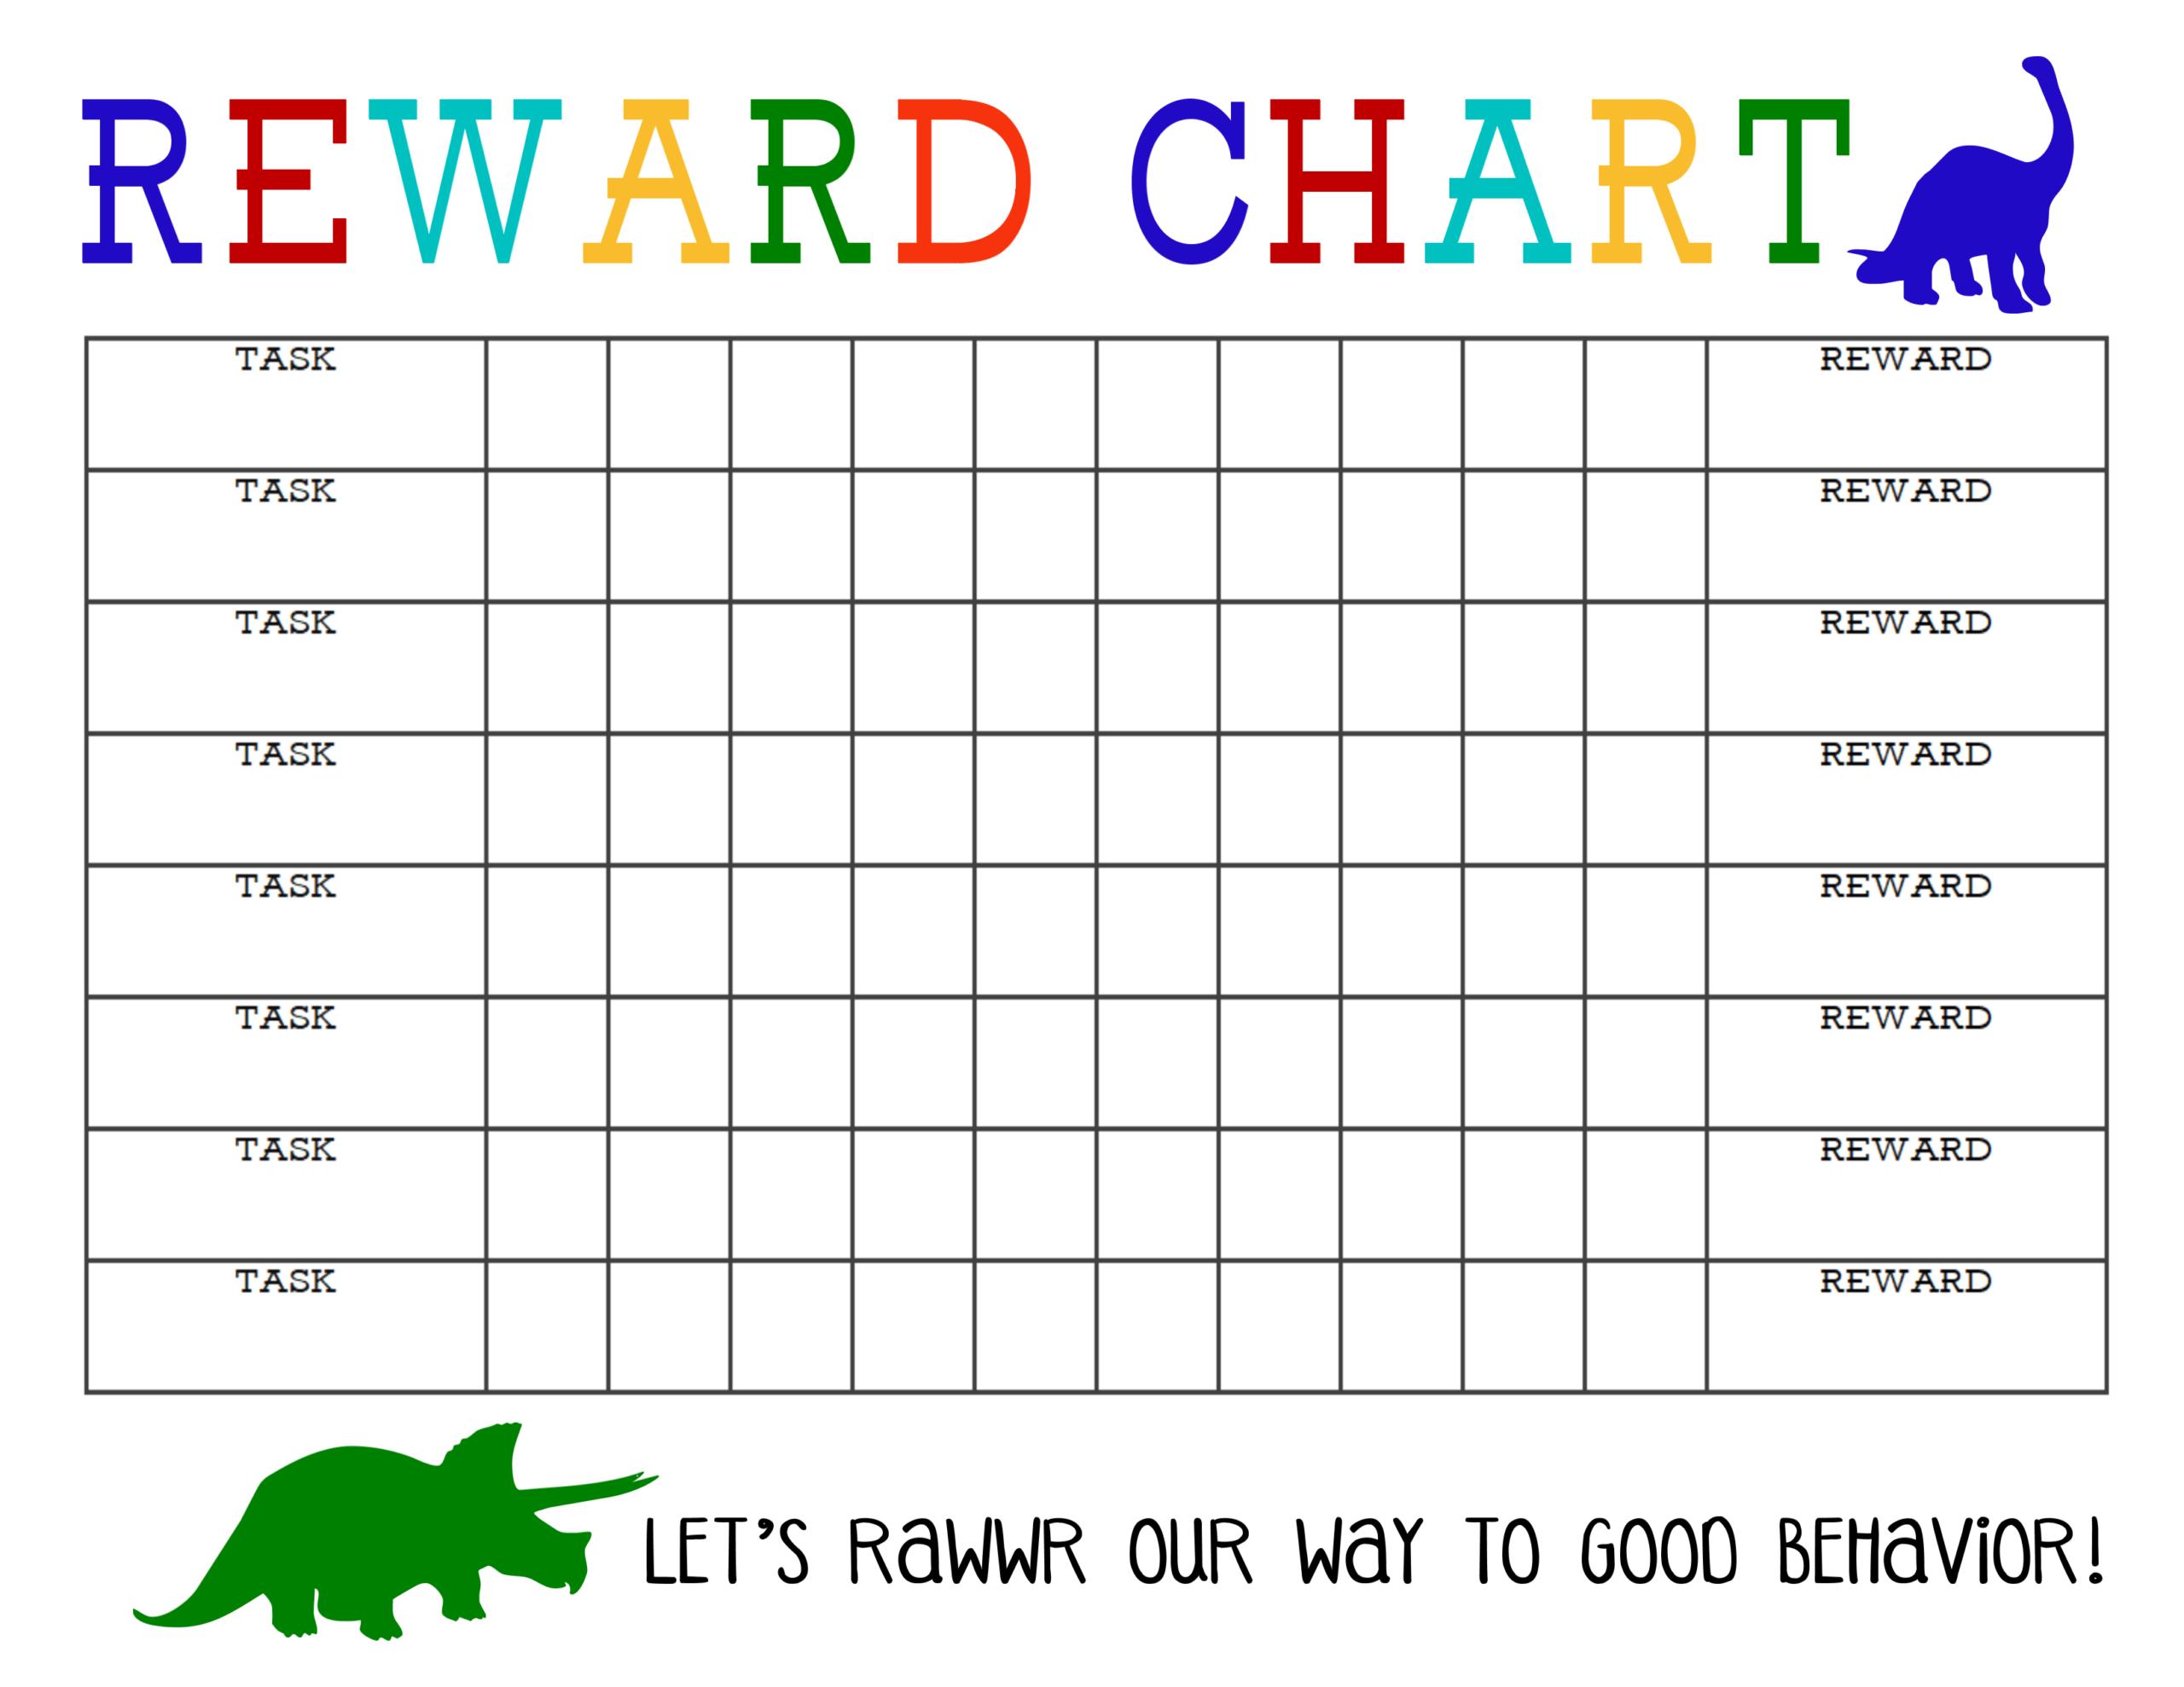 Printable Reward Chart - The Girl Creative in Blank Reward Chart Template